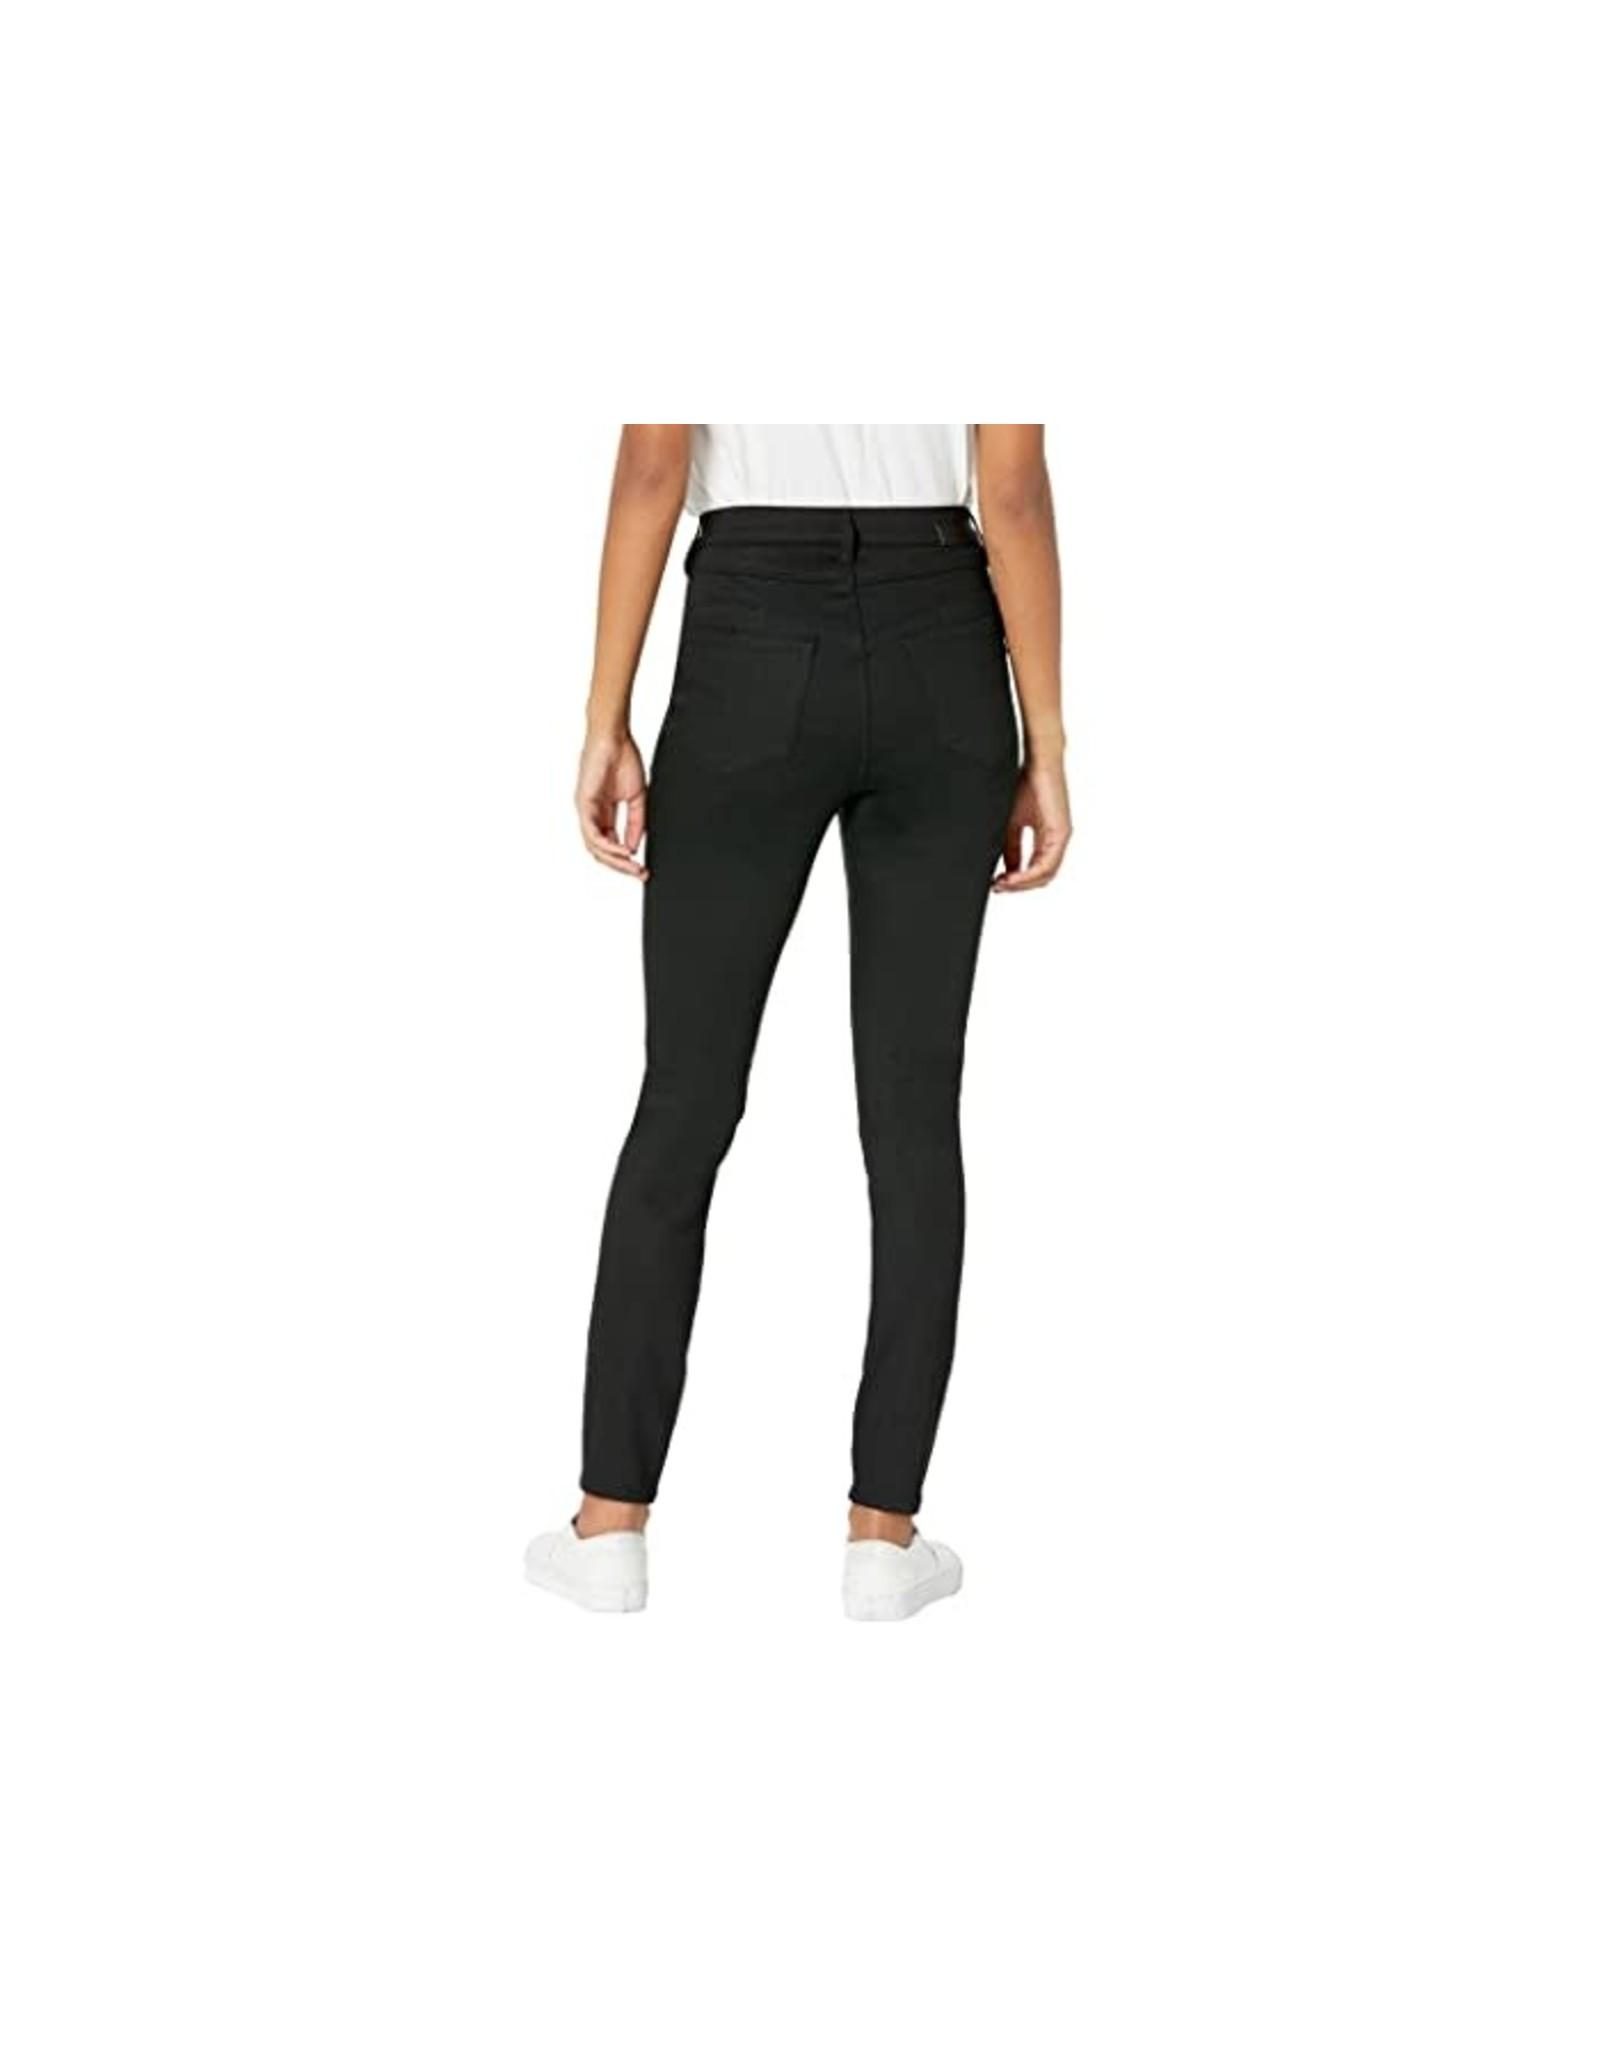 Jag Cecilia High Rise Skinny Jeans Black